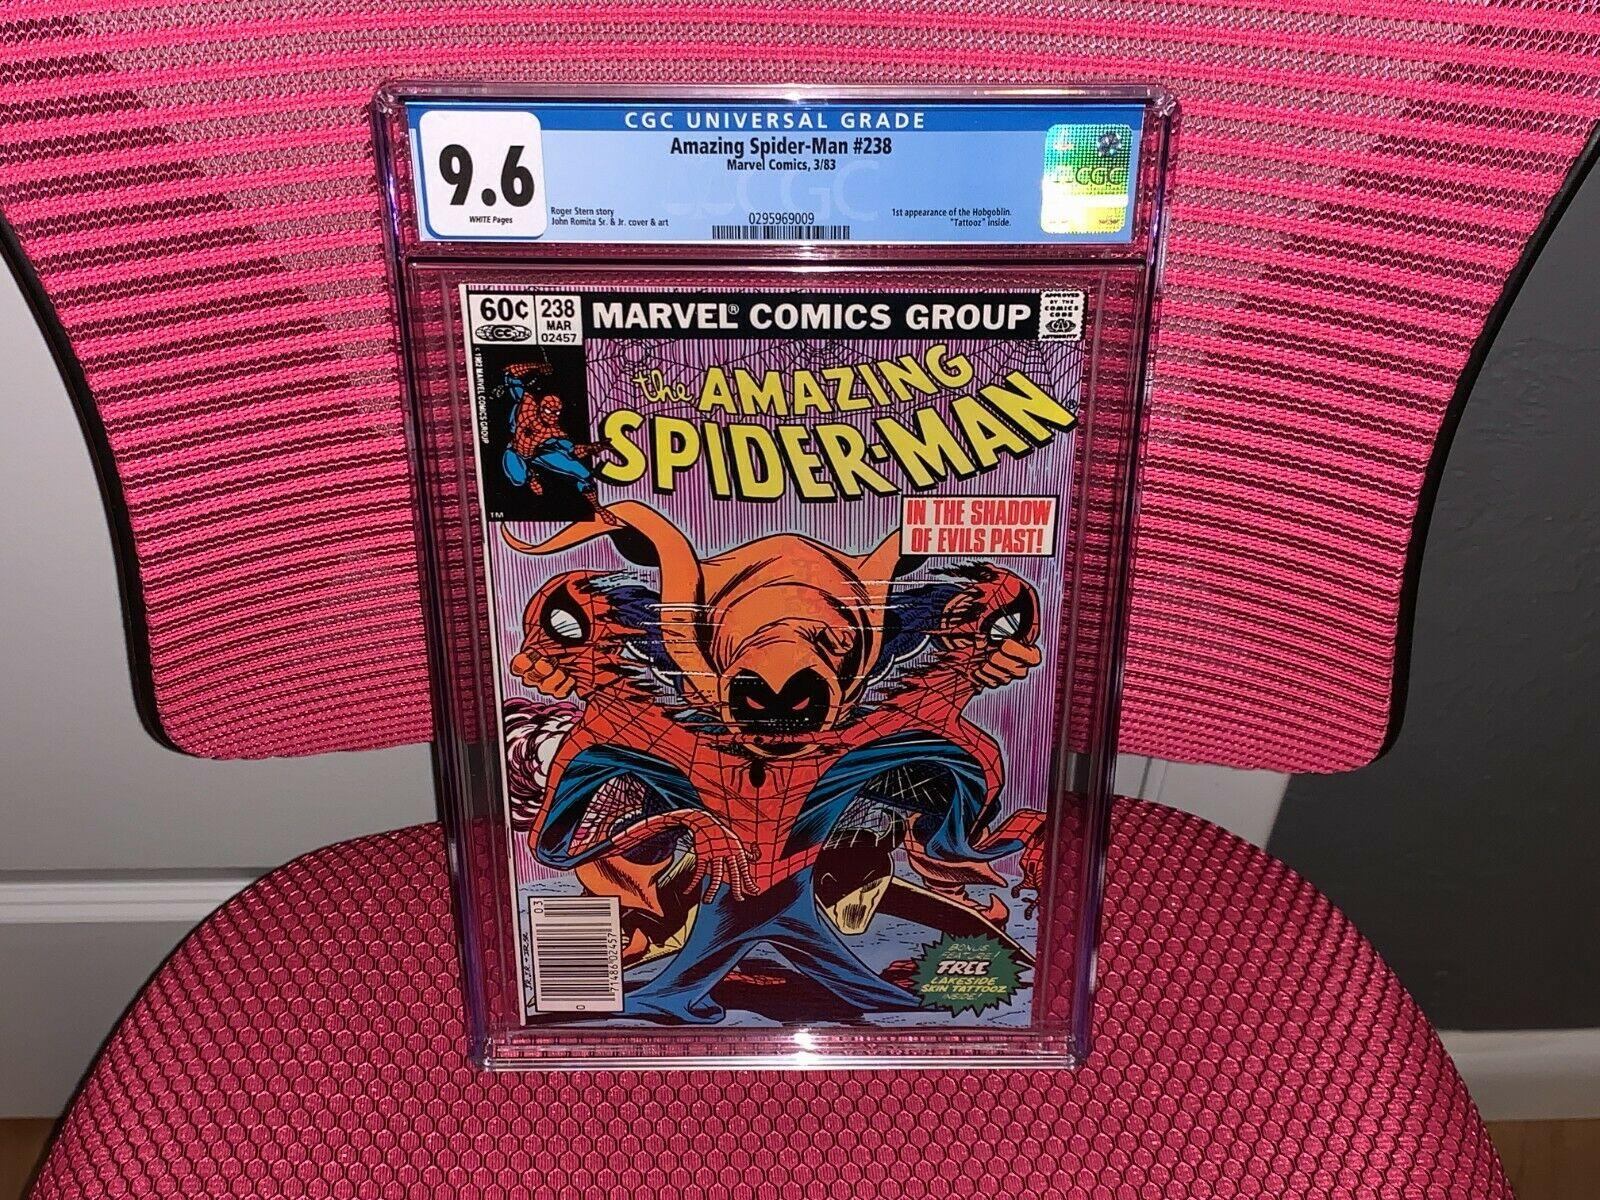 Amazing SpiderMan 238 CGC 96 1st App Hobgoblin